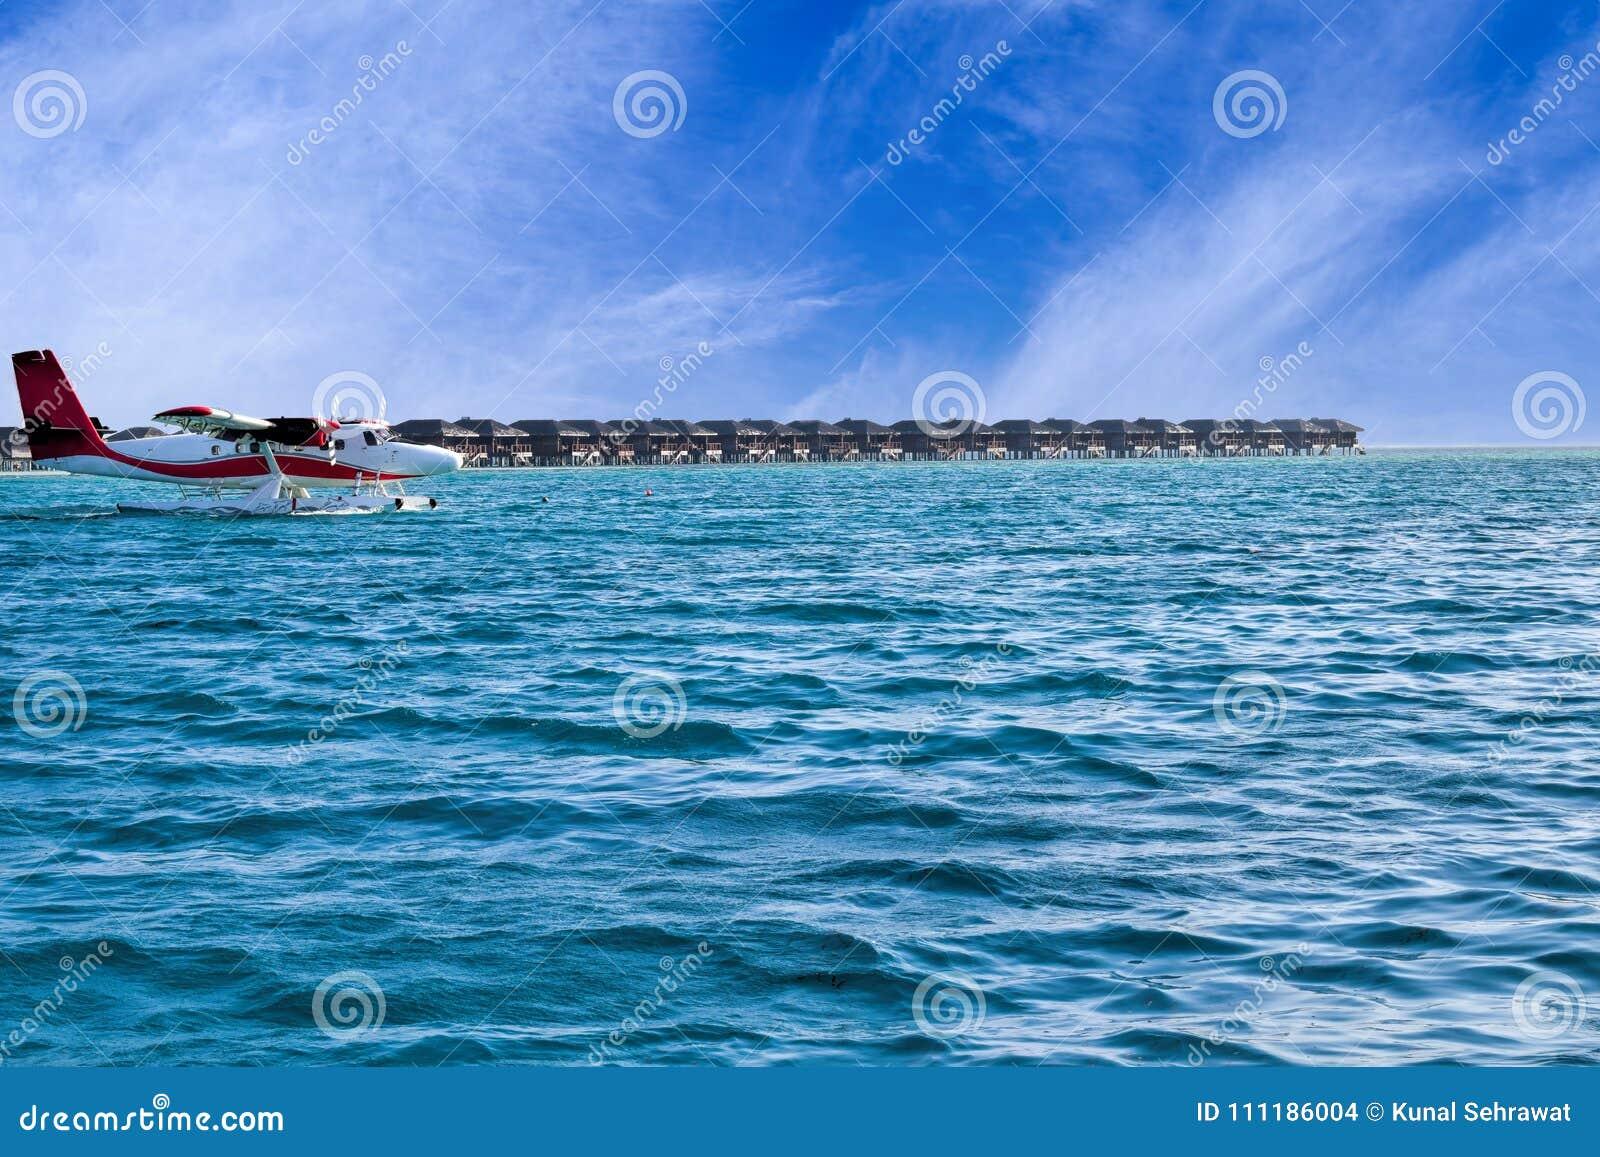 Seaplane And Water Villas At Beautiful Maldives Island